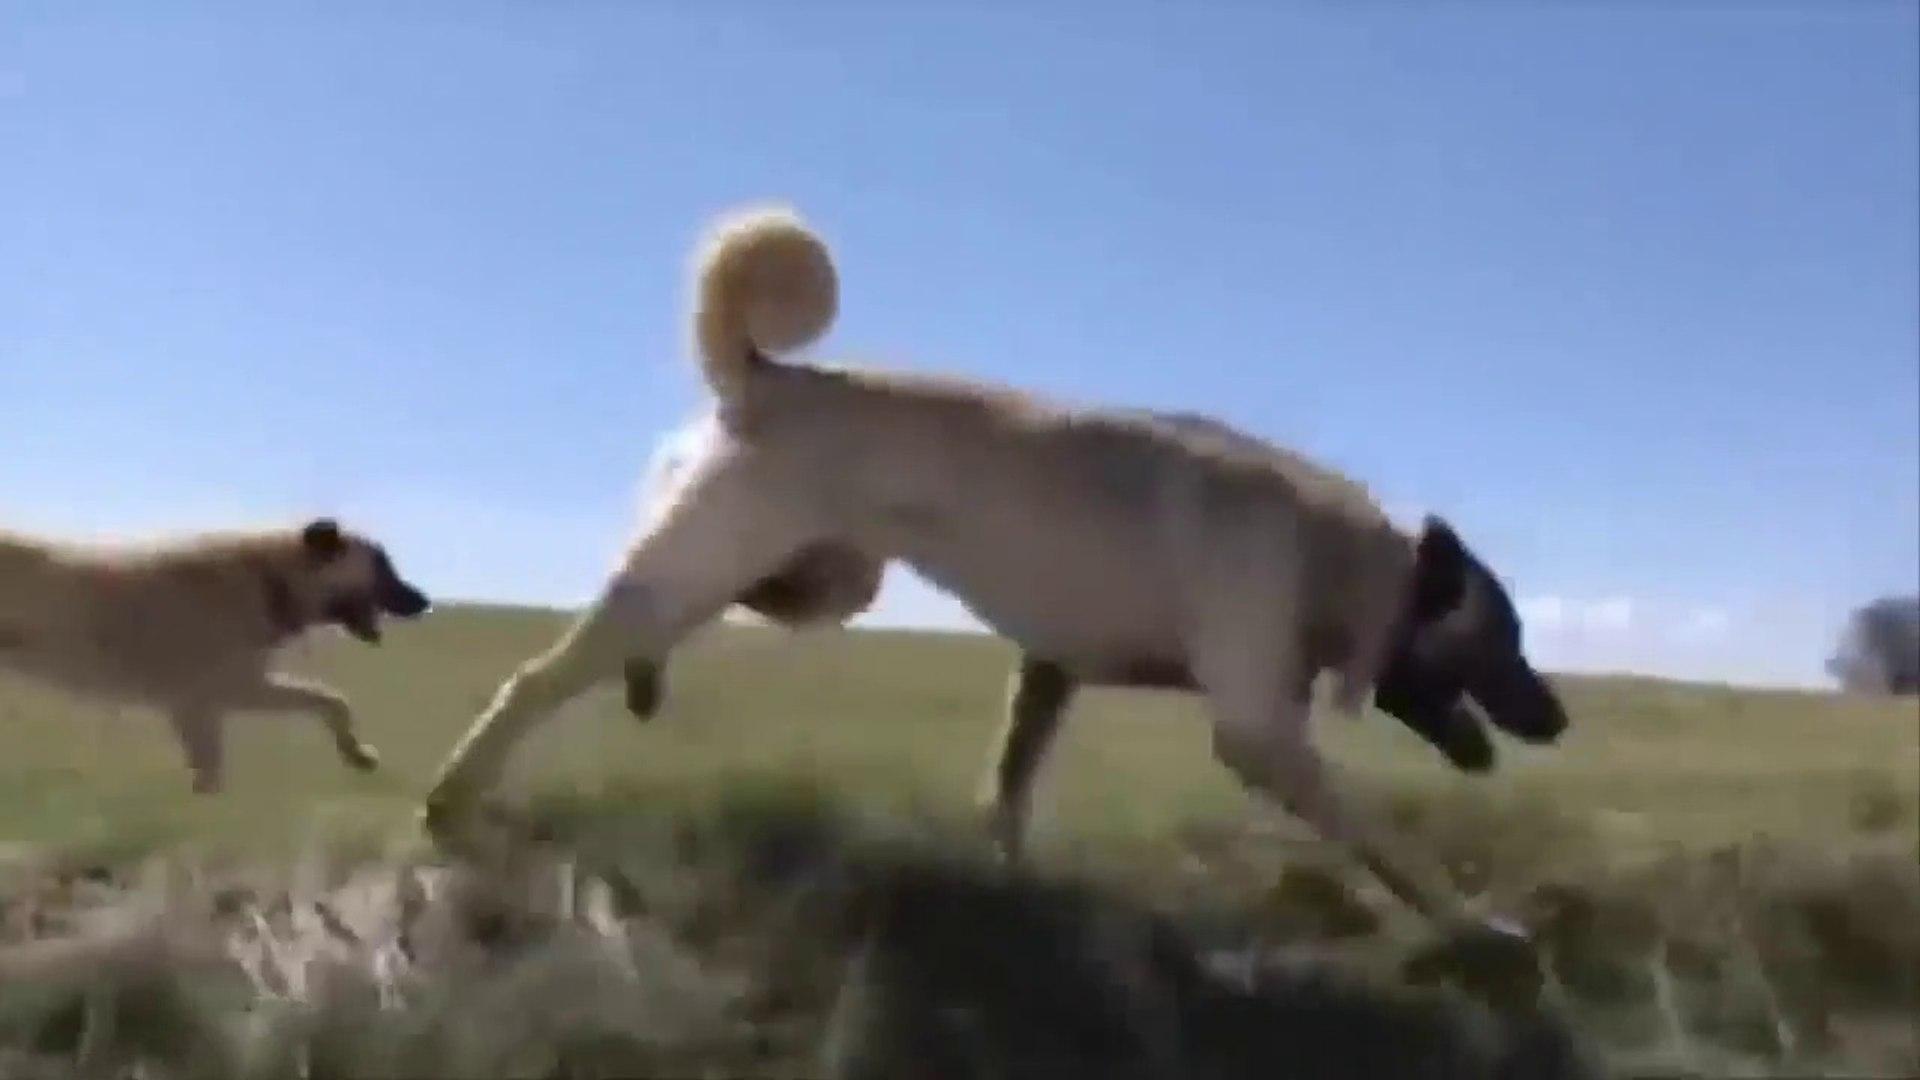 KANGAL KOPEKLERi BiRLiKTE KOSUYOR - KANGAL SHEPHERD DOG RUNNiNG